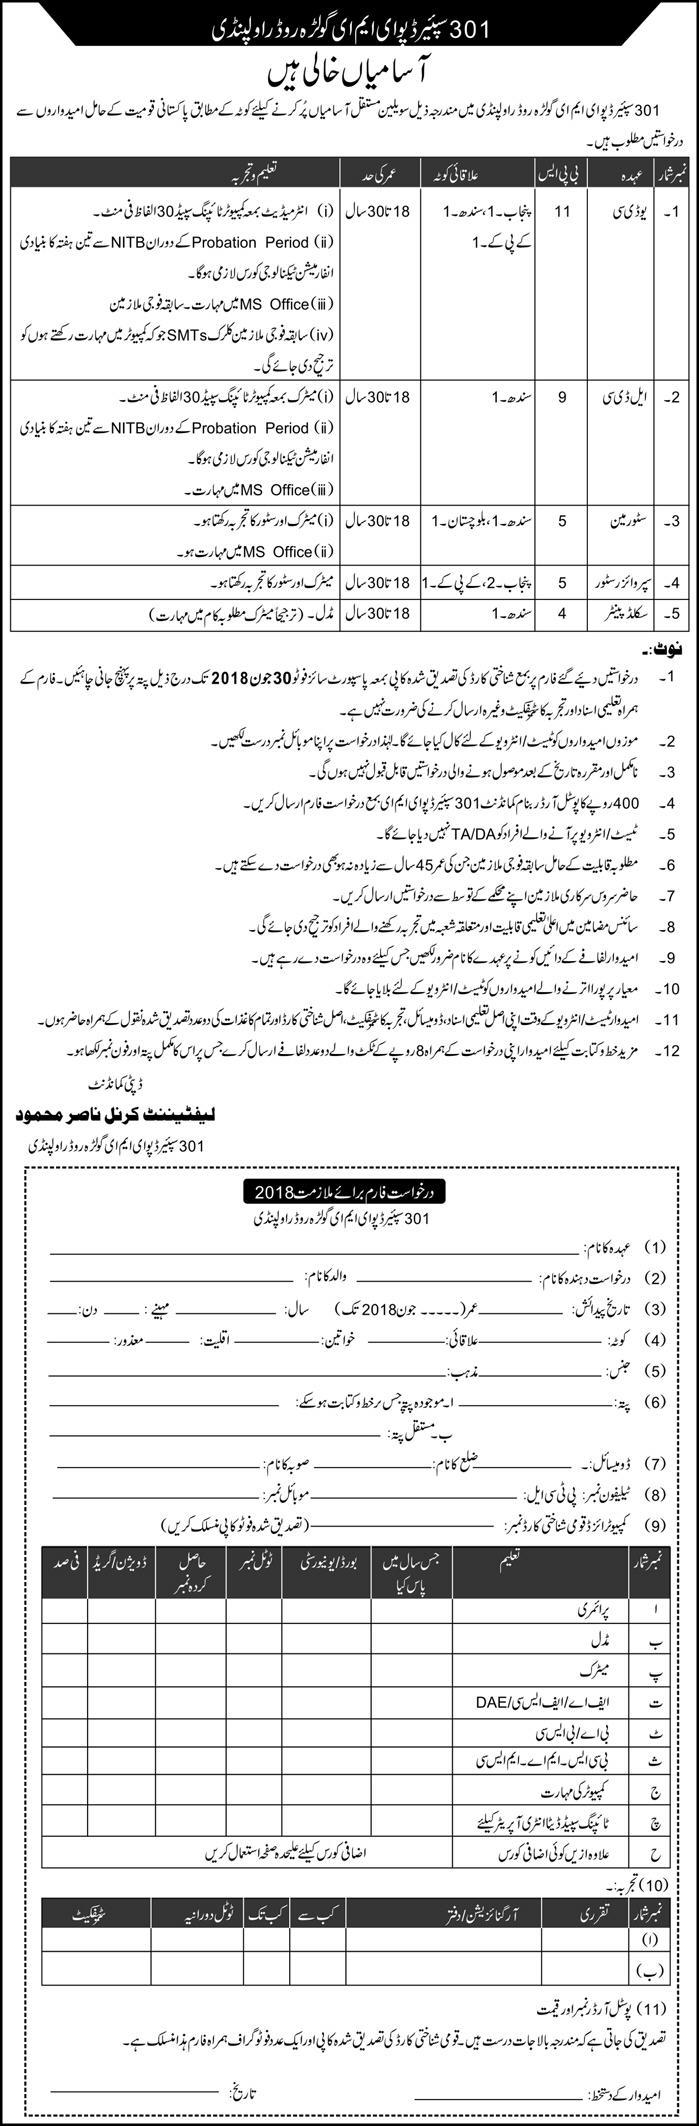 Join Army as civilian 301 spear Depot EME Rawalpindi Latest Jobs 2018-thumbnail